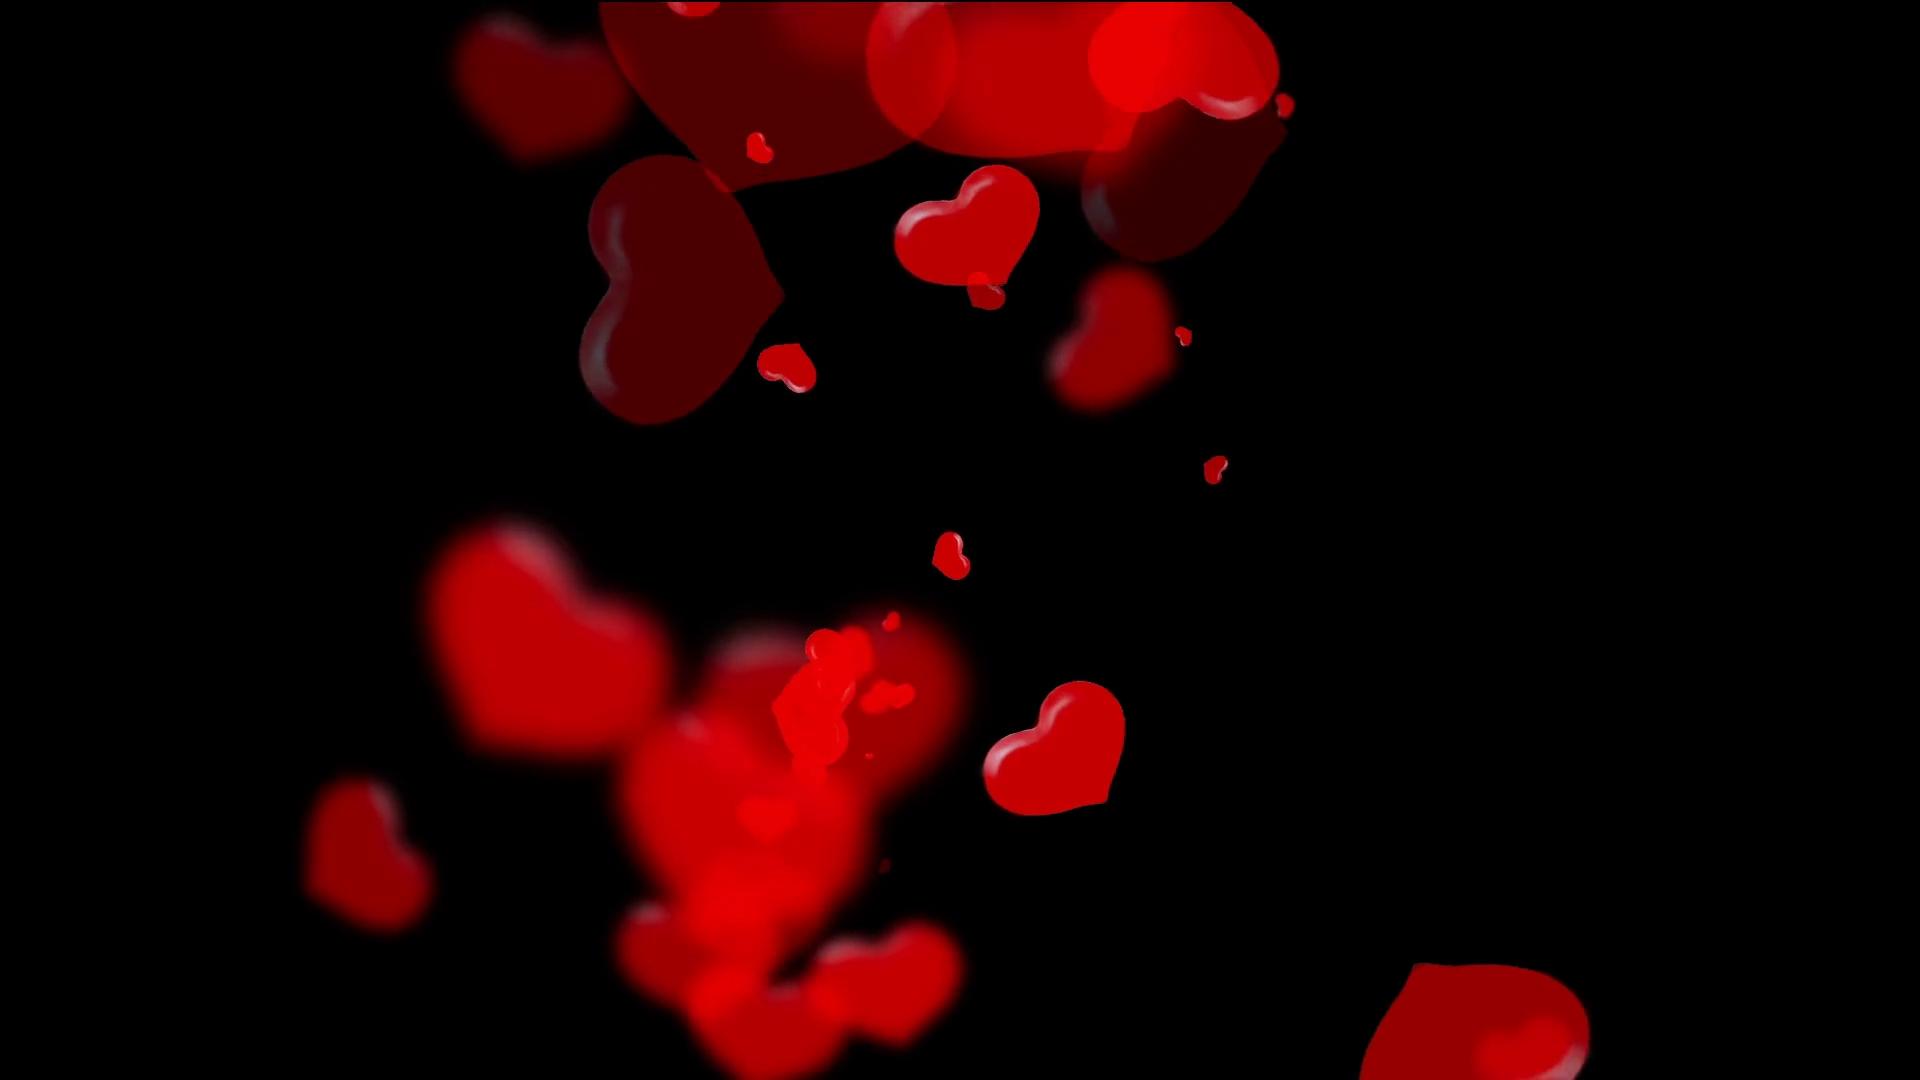 vivid translucent red hearts on black background, valentine's day